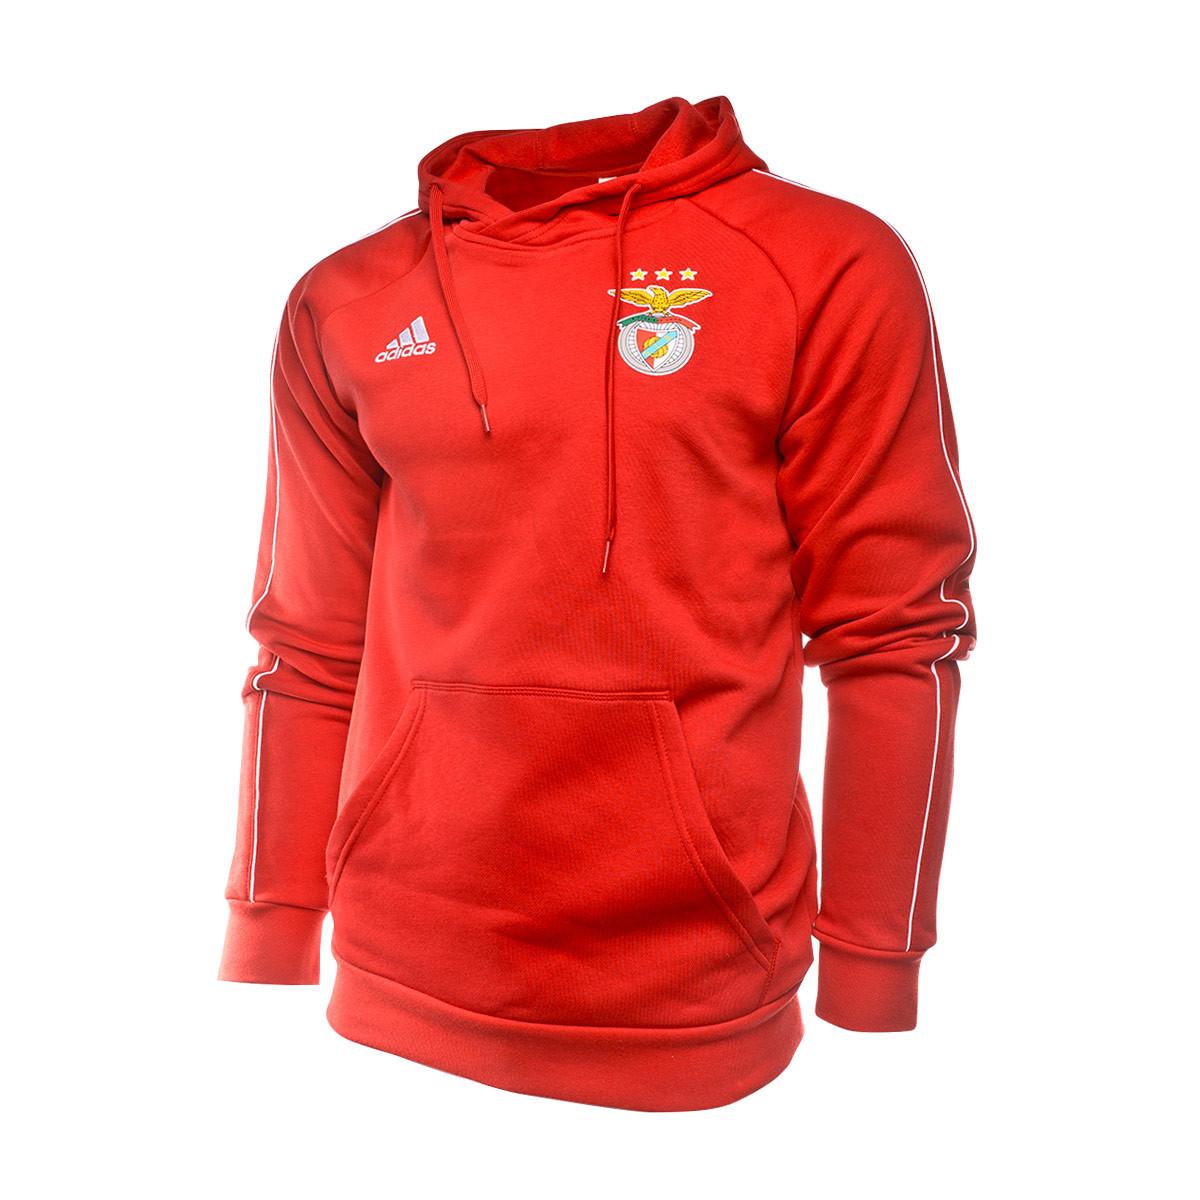 Adidas Liverpool Hoodie (RedWhite)